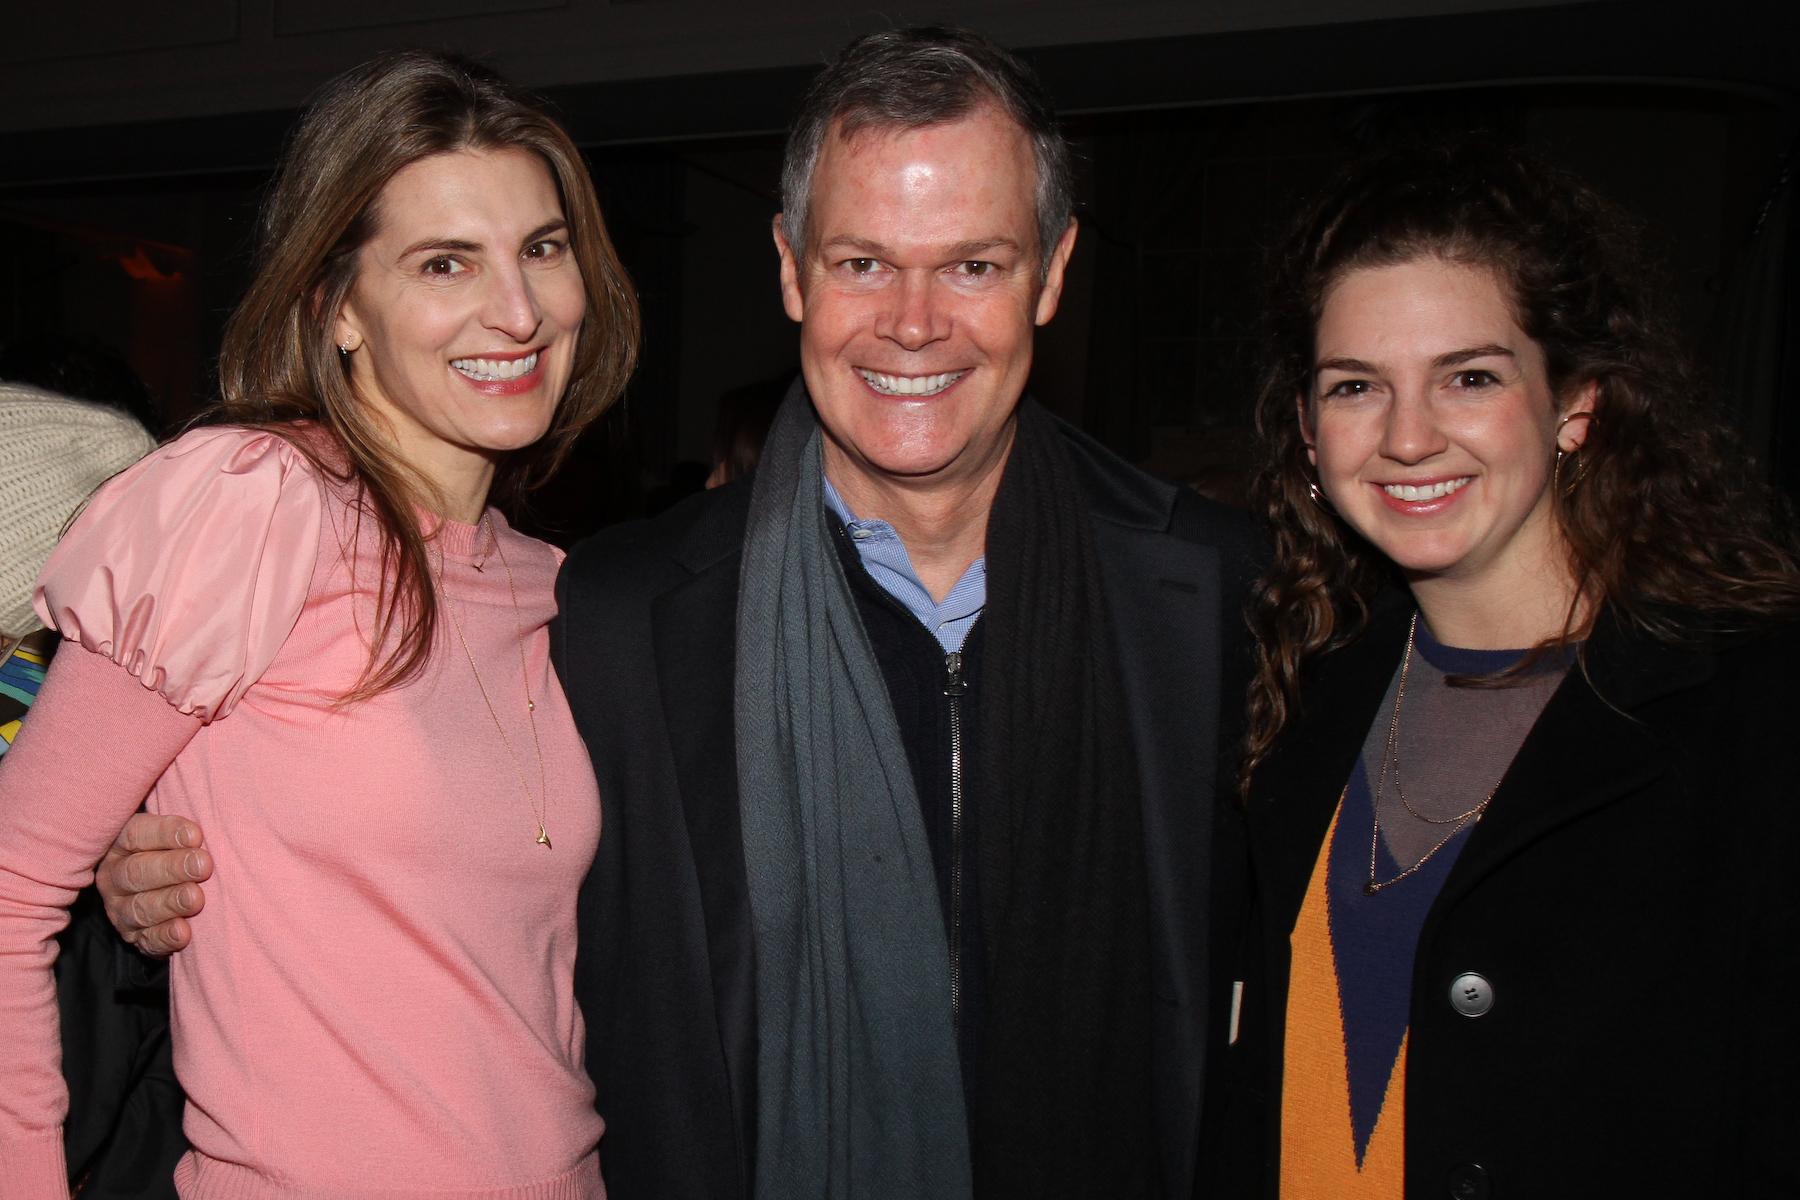 Blair Voltz Clarke, Alistair Clarke, Georgina Clarke © Cutty McGill